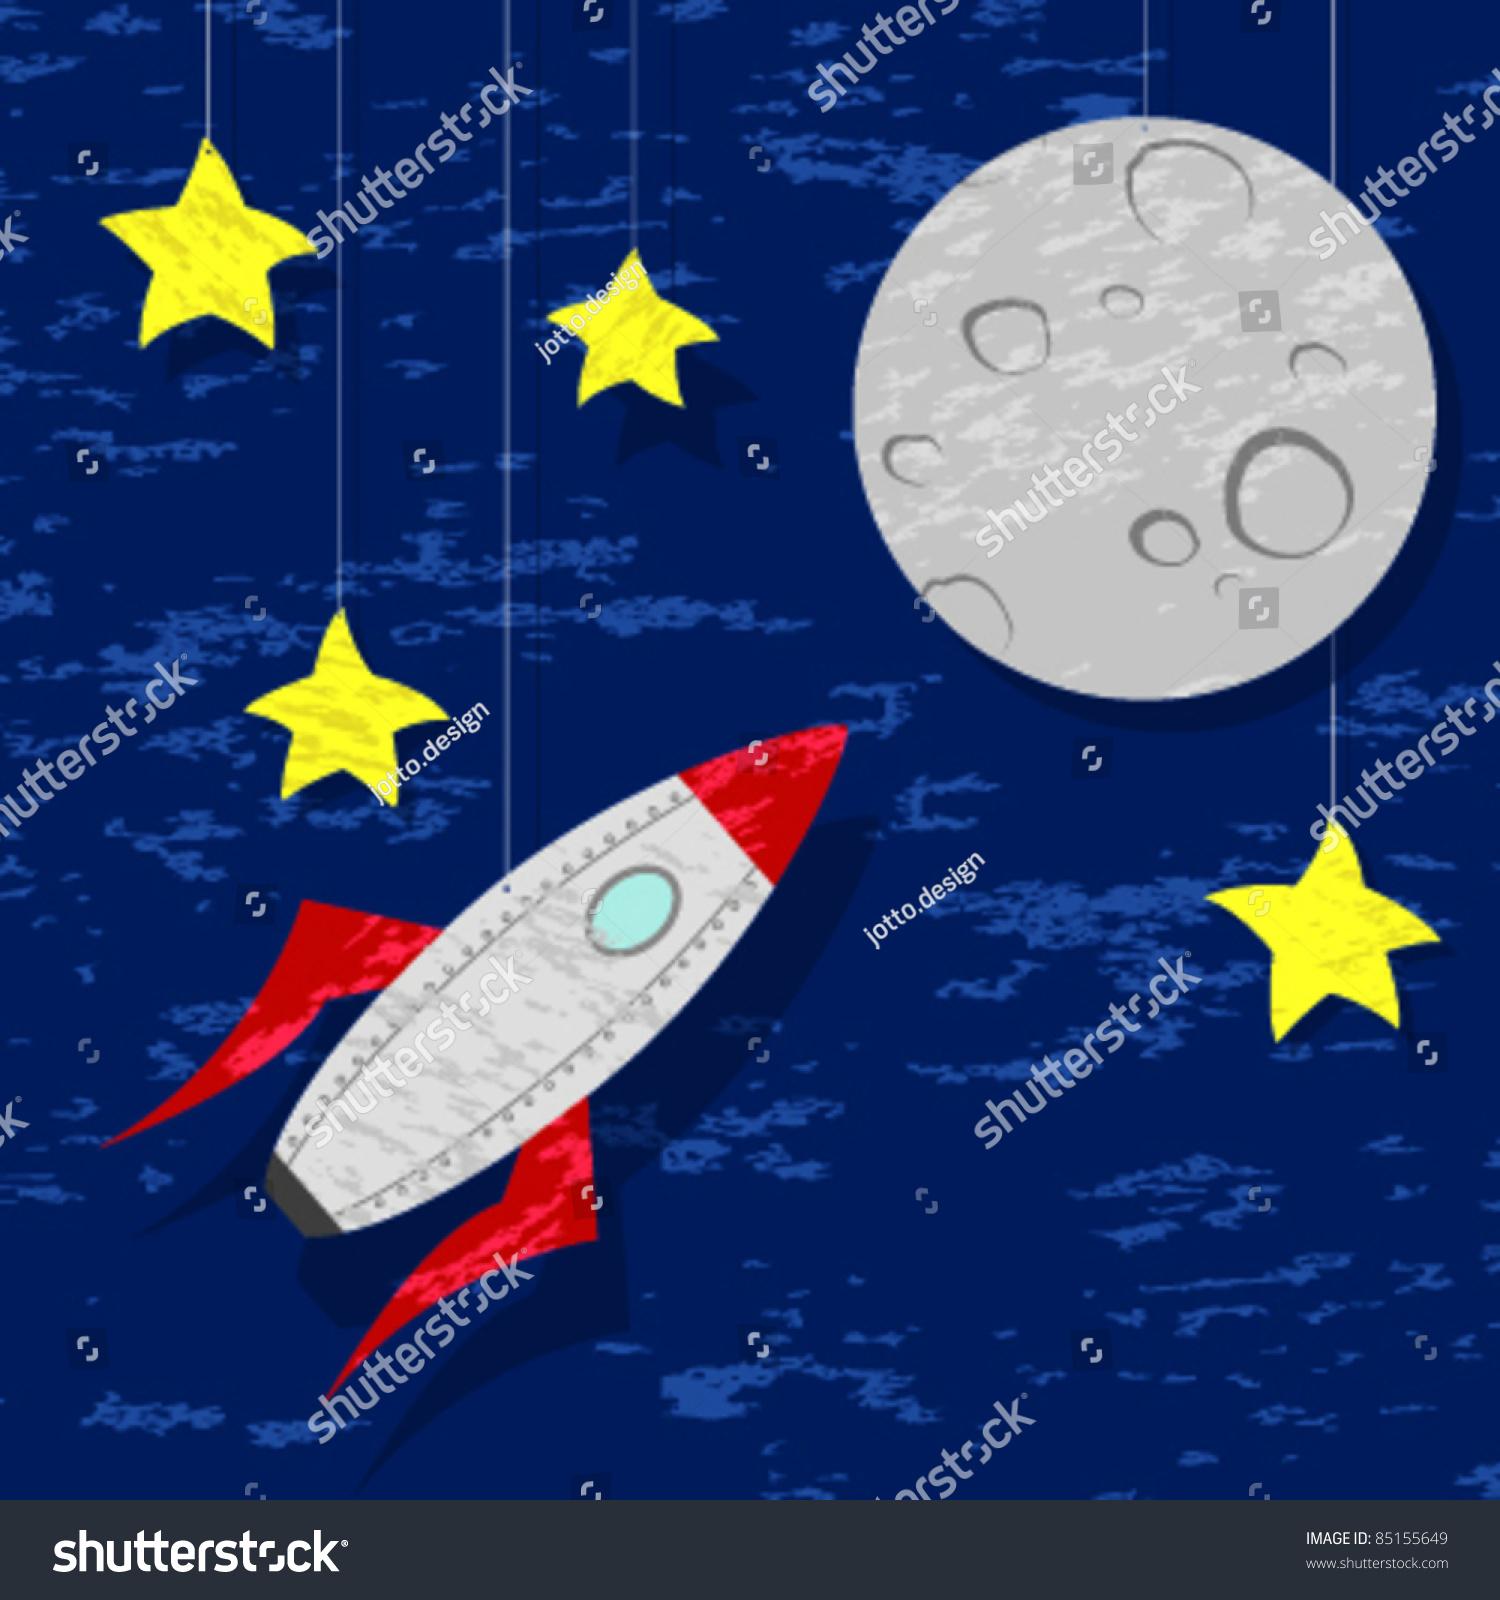 Rockets To The Moon: Rocket Moon Stock Vector 85155649